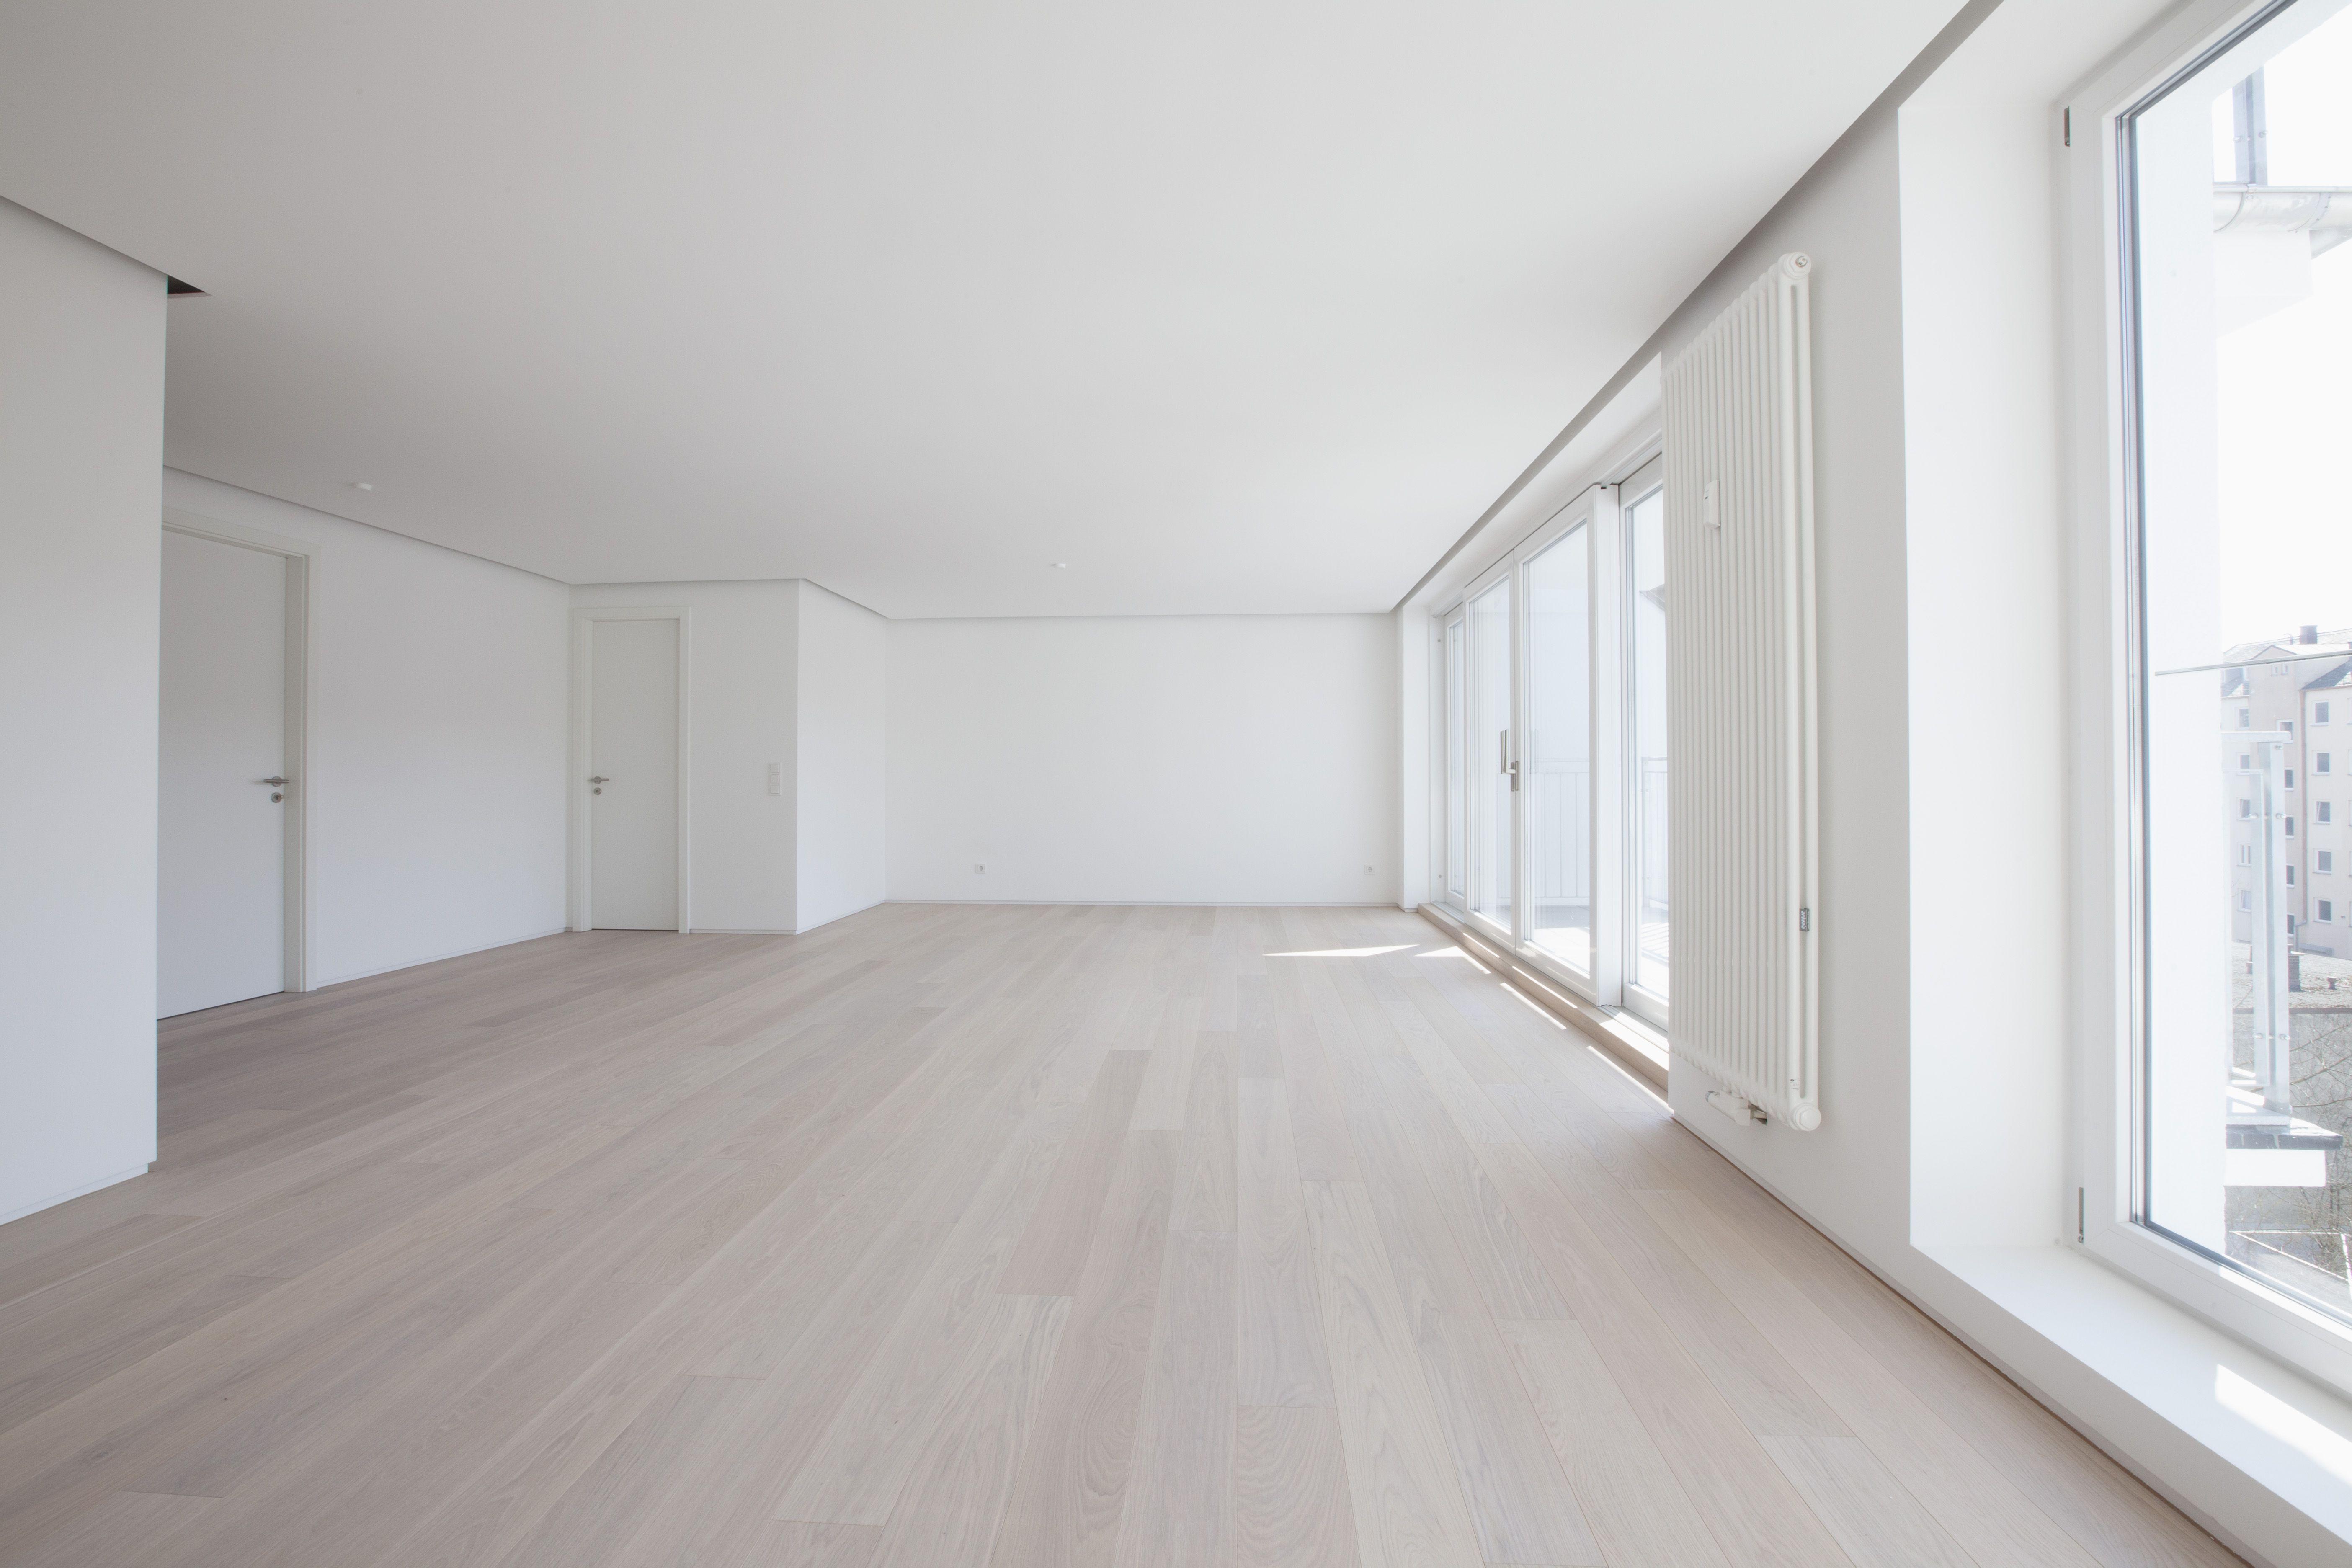 5 16 inch solid hardwood flooring of basics of favorite hybrid engineered wood floors inside empty living room in modern apartment 578189139 58866f903df78c2ccdecab05